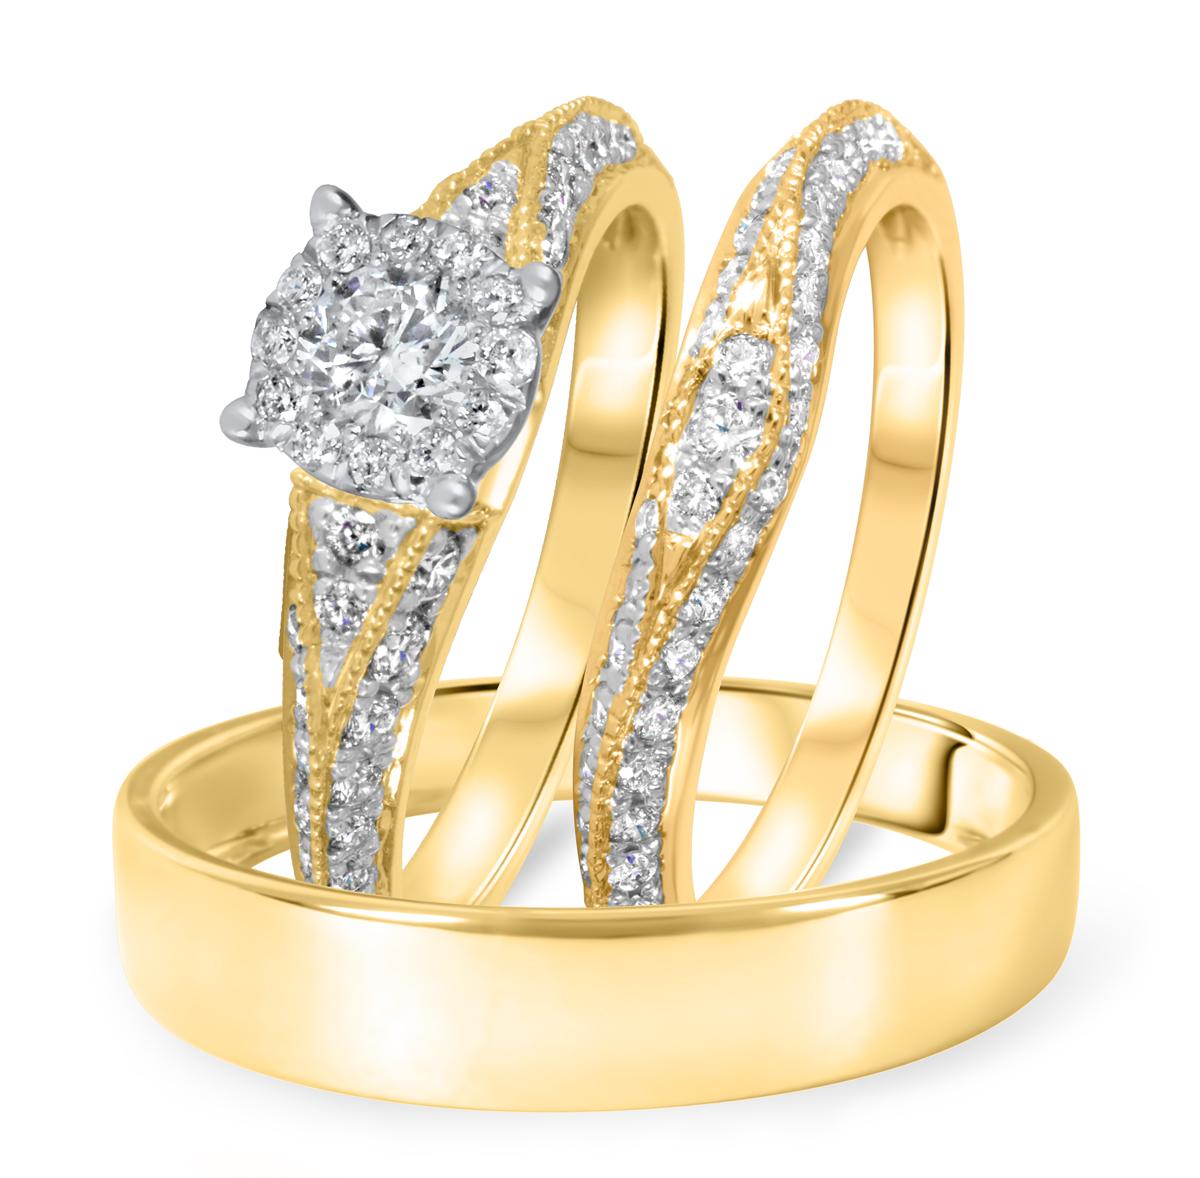 1 1/4 CT. T.W. Diamond Ladies Engagement Ring, Wedding Band, Men's Wedding Band